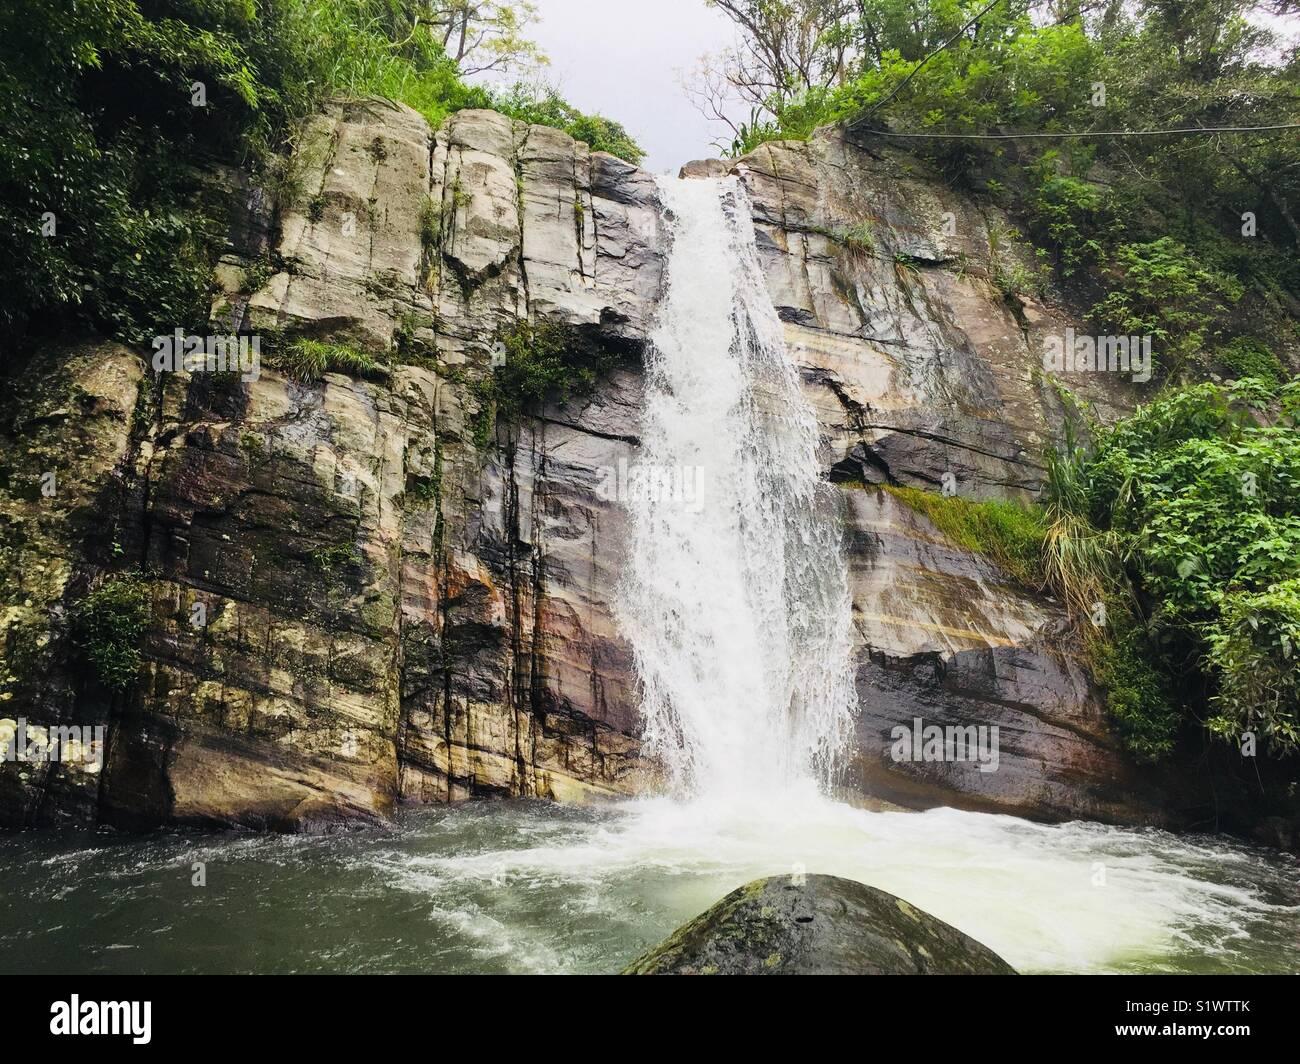 Mandaramnuwara, Srilanka. - Stock Image